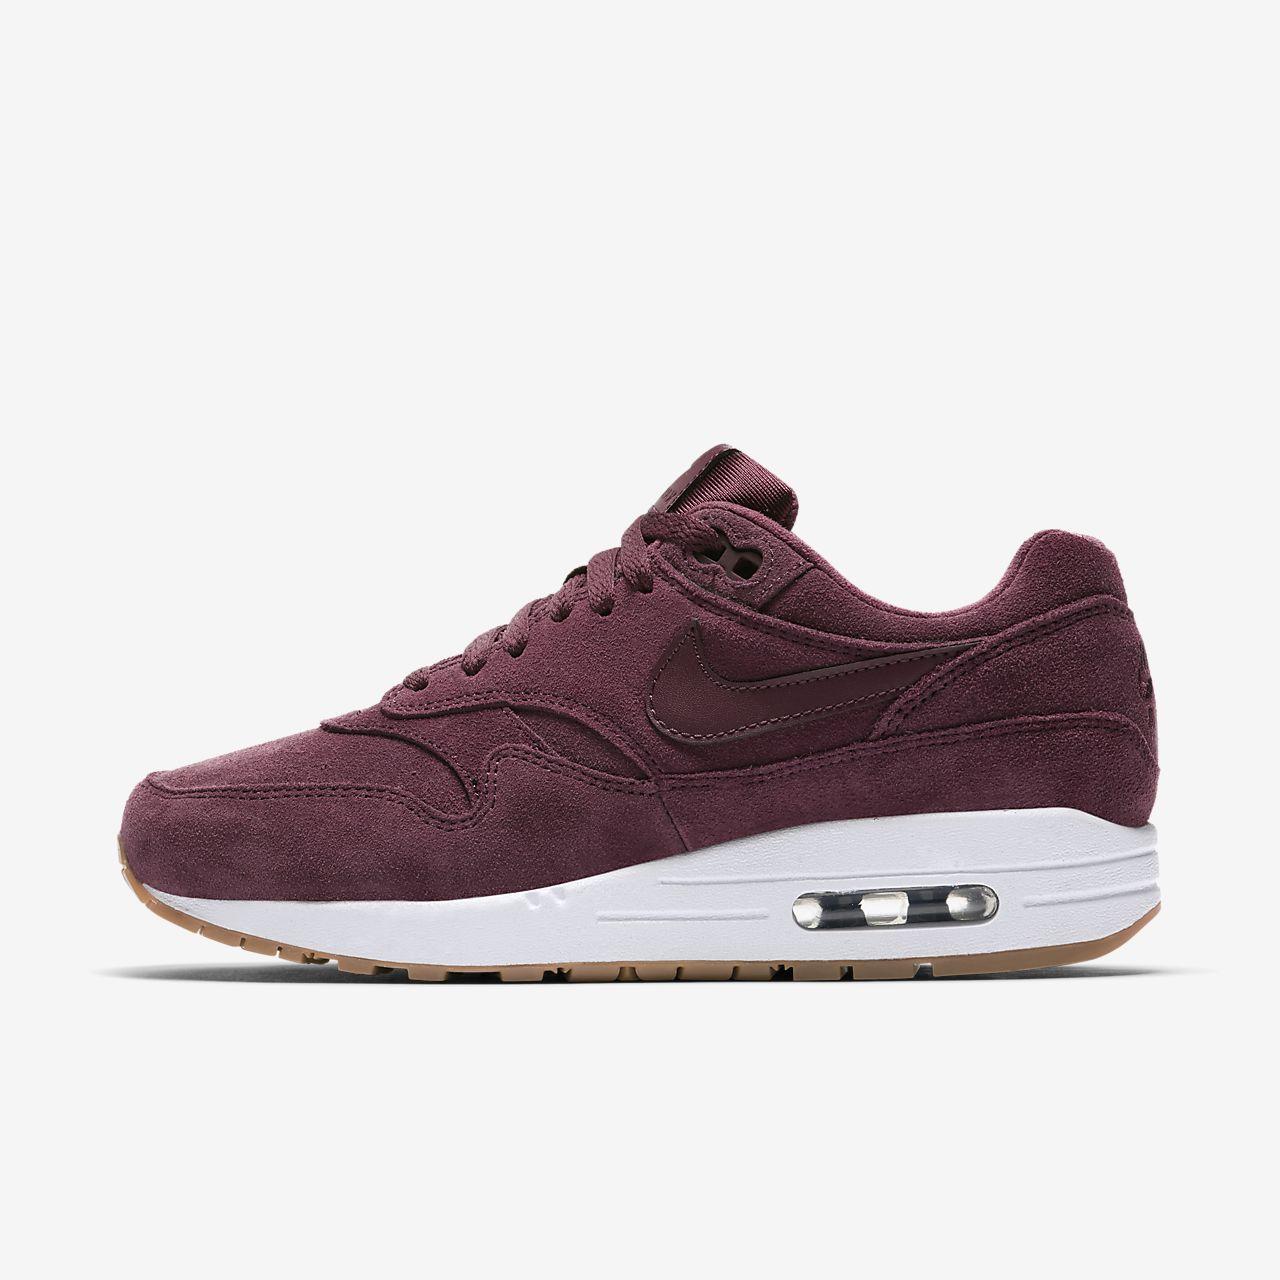 best sneakers 44fc8 b39e5 ... Nike Air Max 1 SE-sko til kvinder